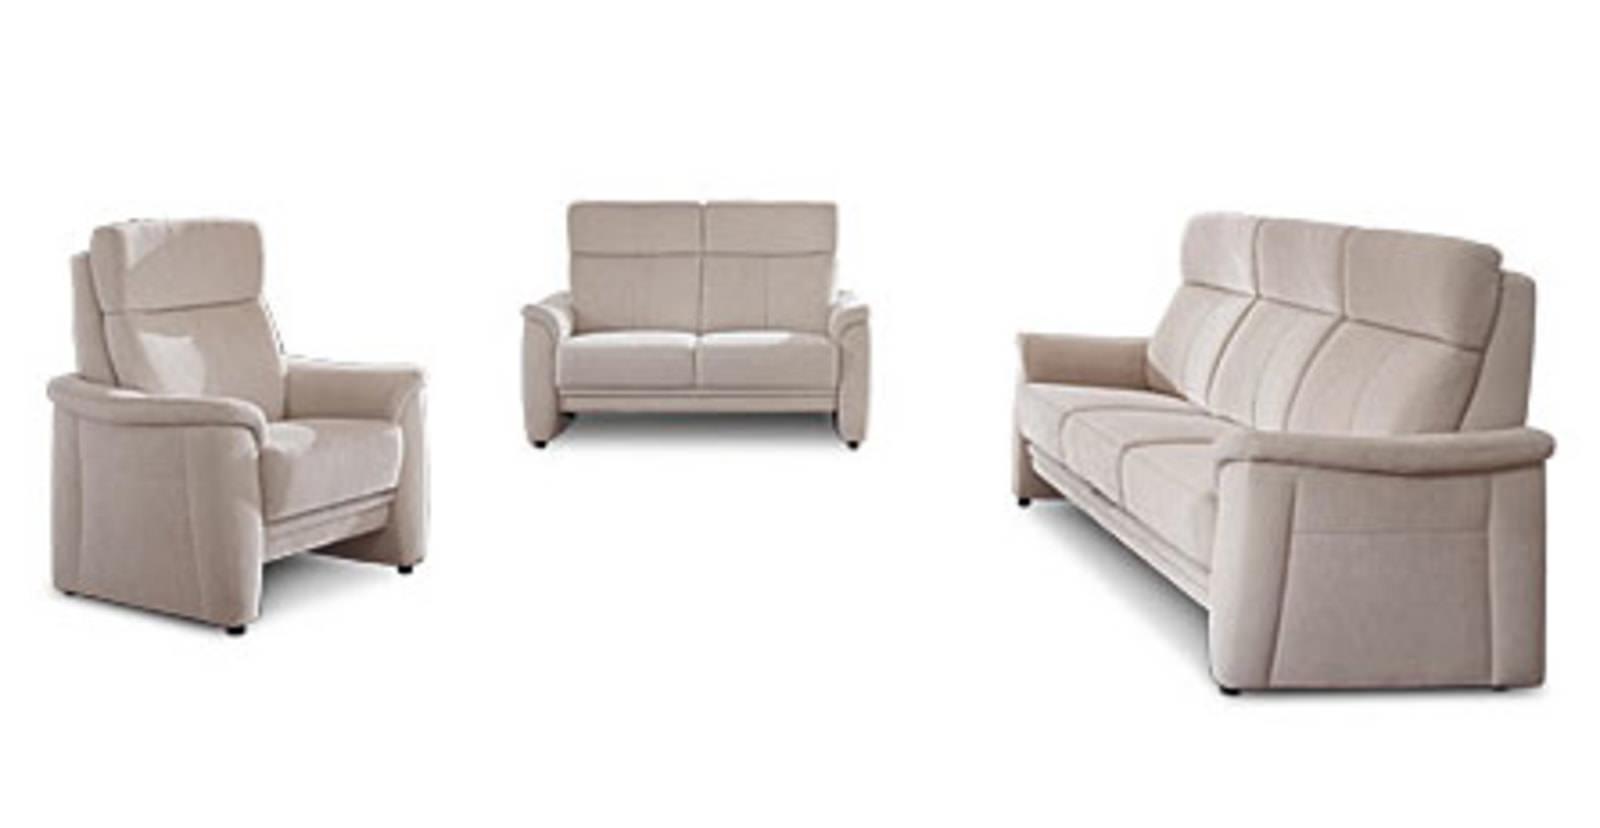 sofa garnitur 3 teilig free fabelhaft sofa garnitur teilig latest fabulous full size sofa. Black Bedroom Furniture Sets. Home Design Ideas